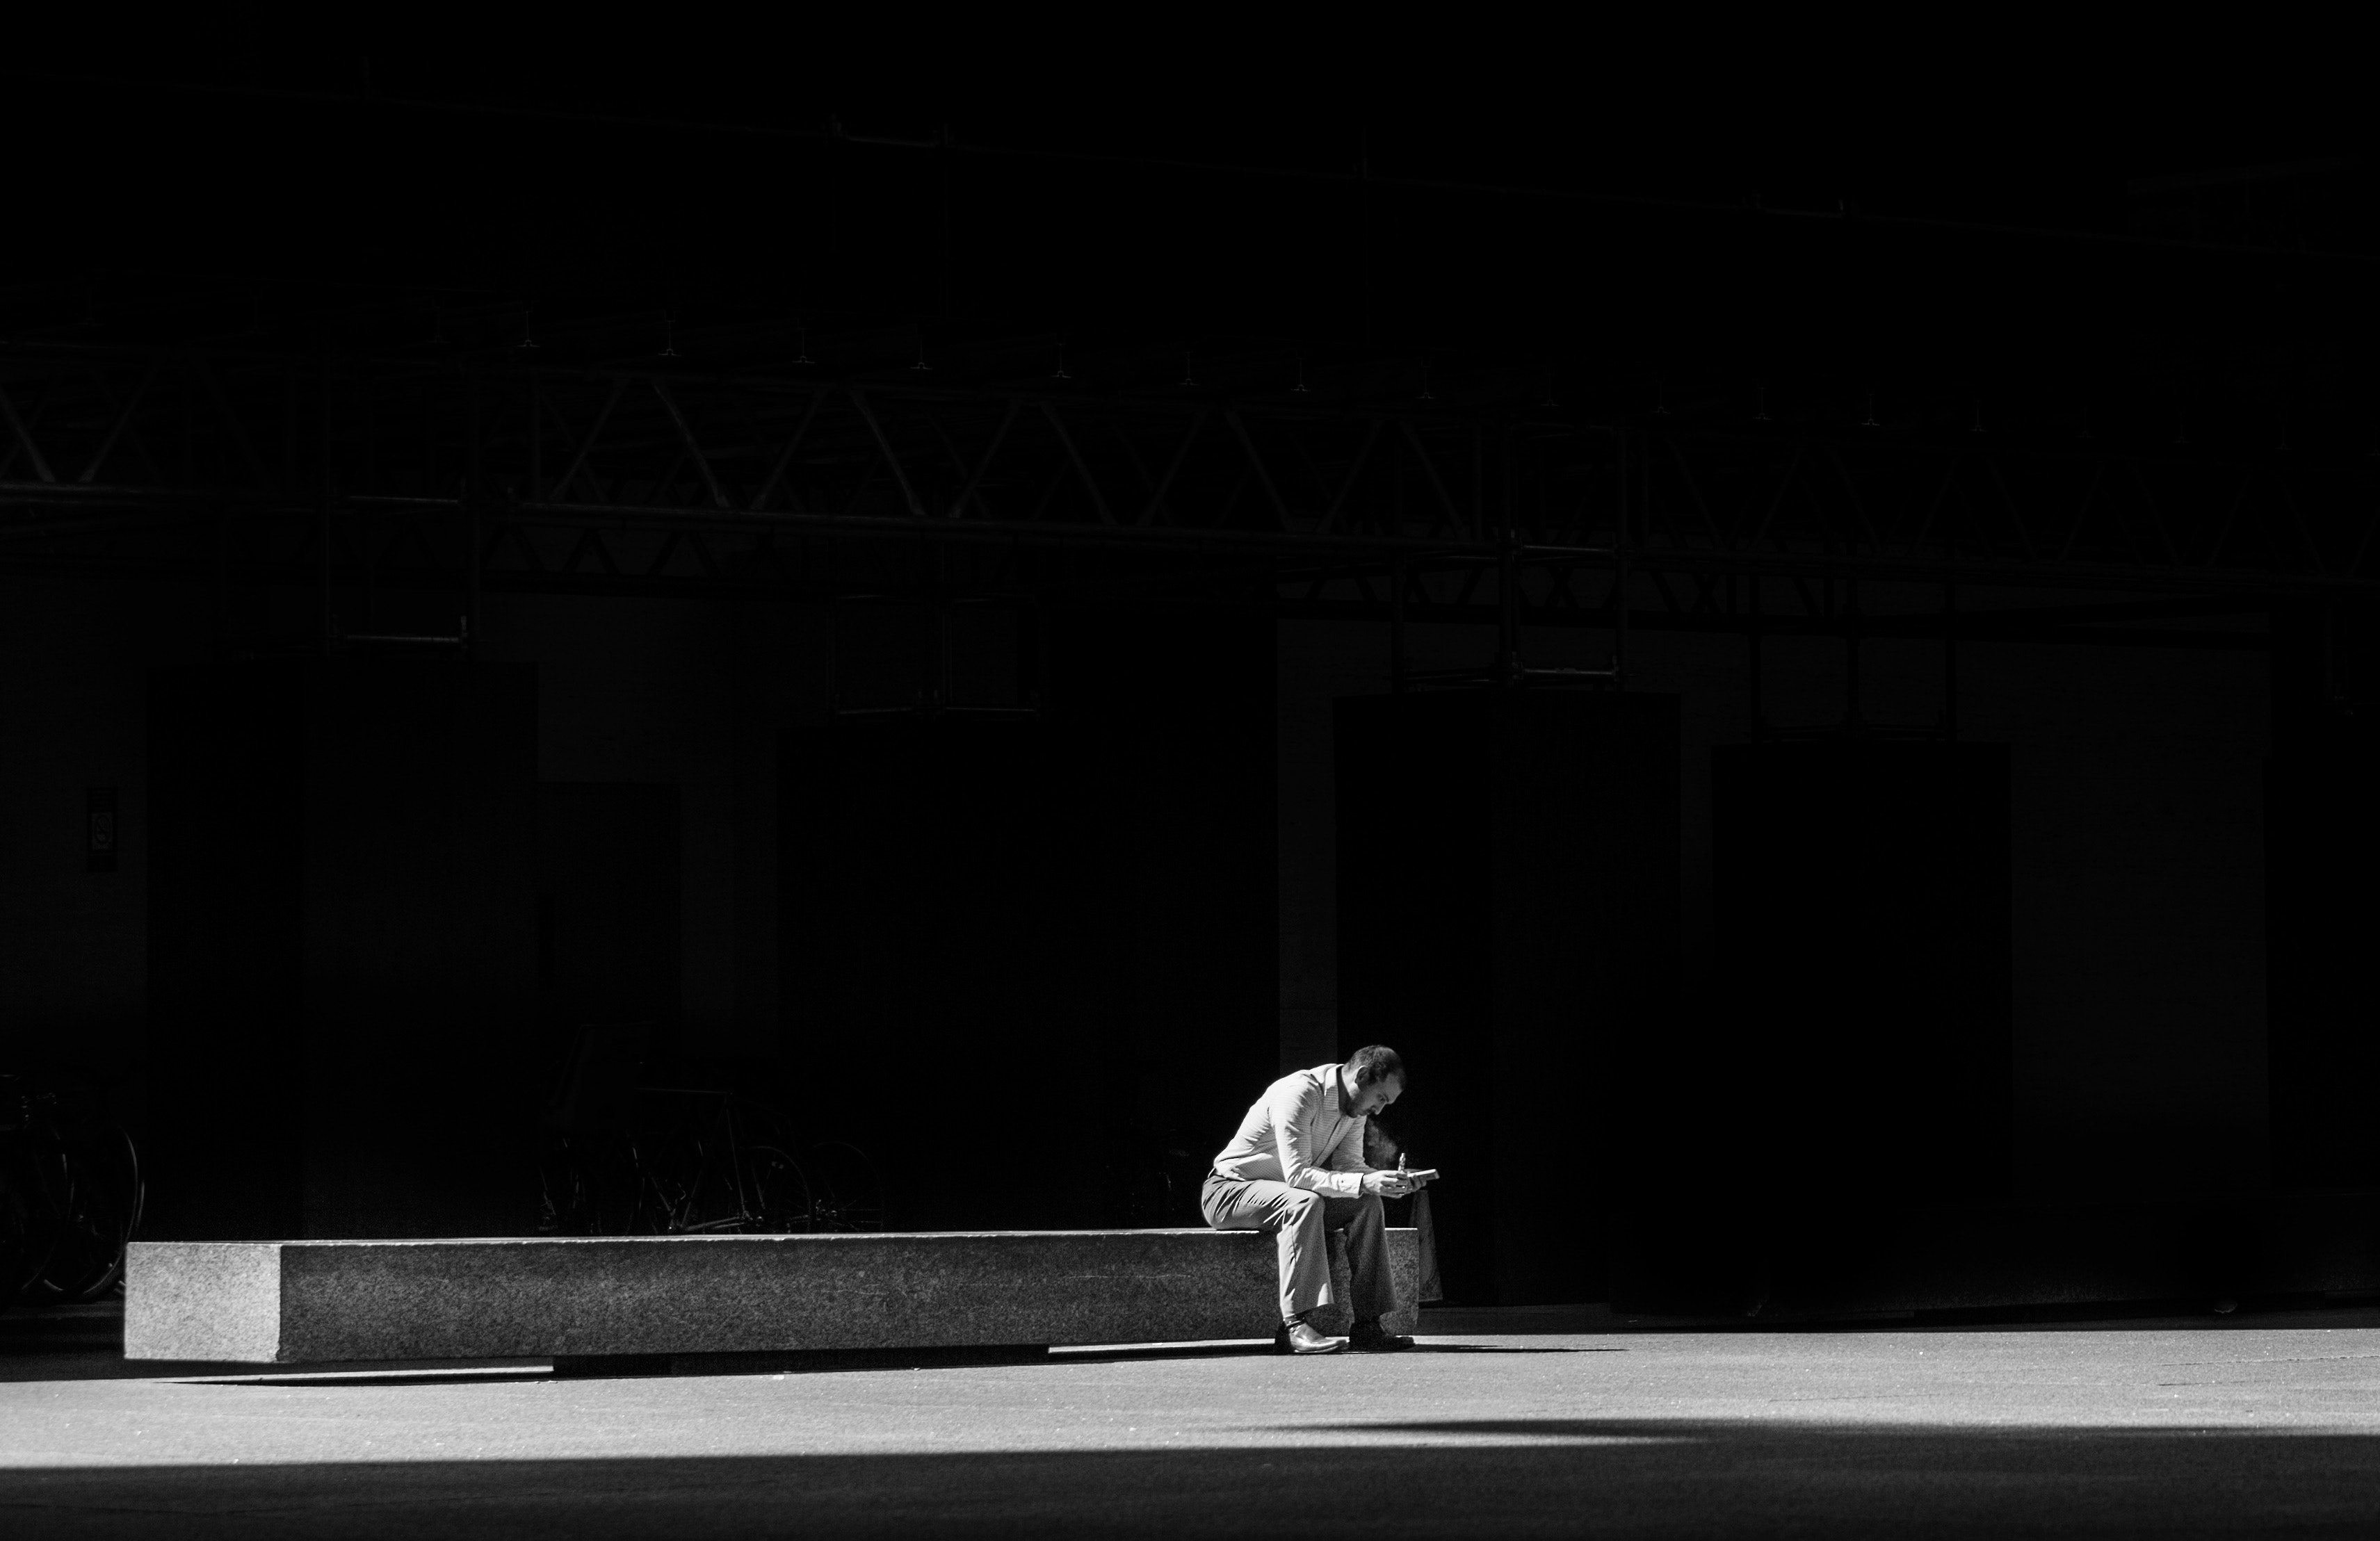 adult-alone-art-373914